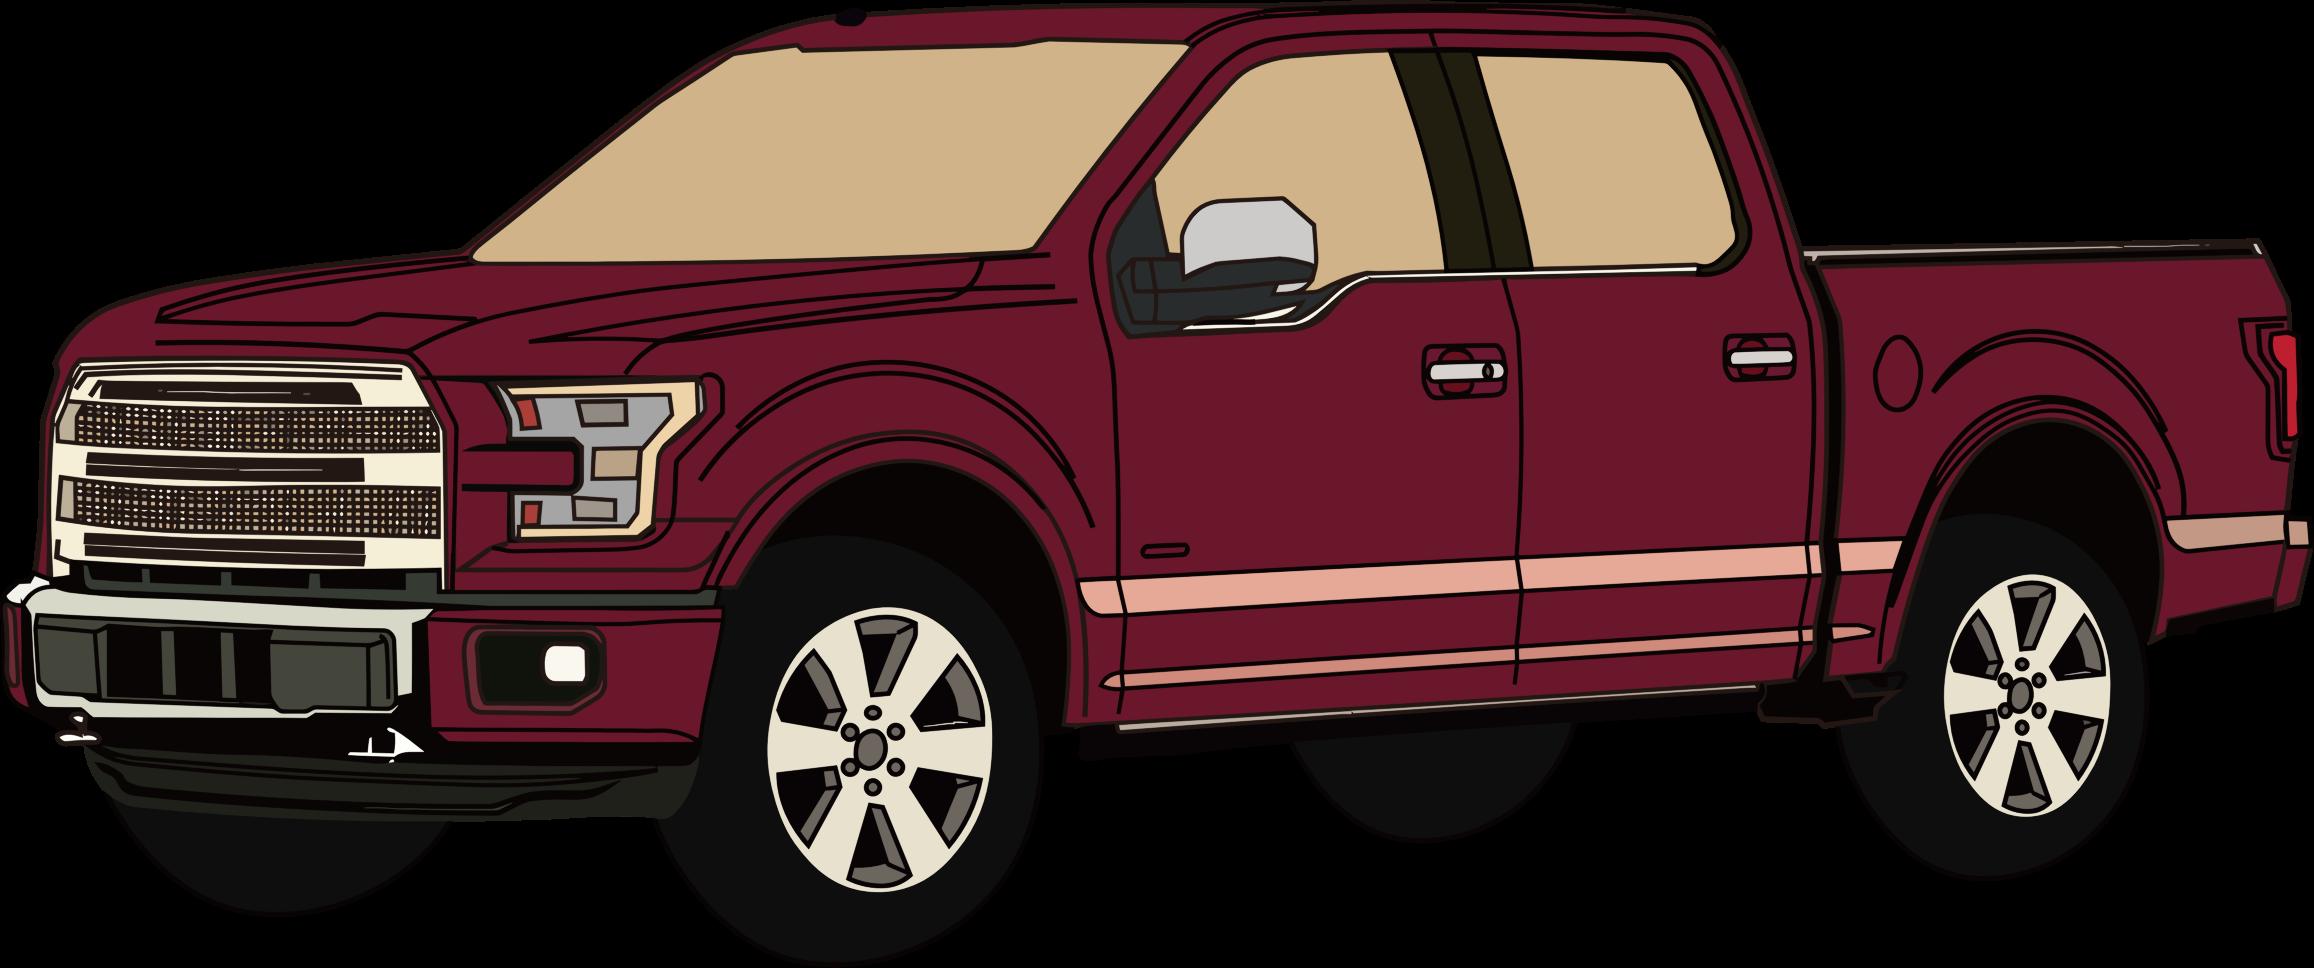 Pickup truck clipart - ClipartFest